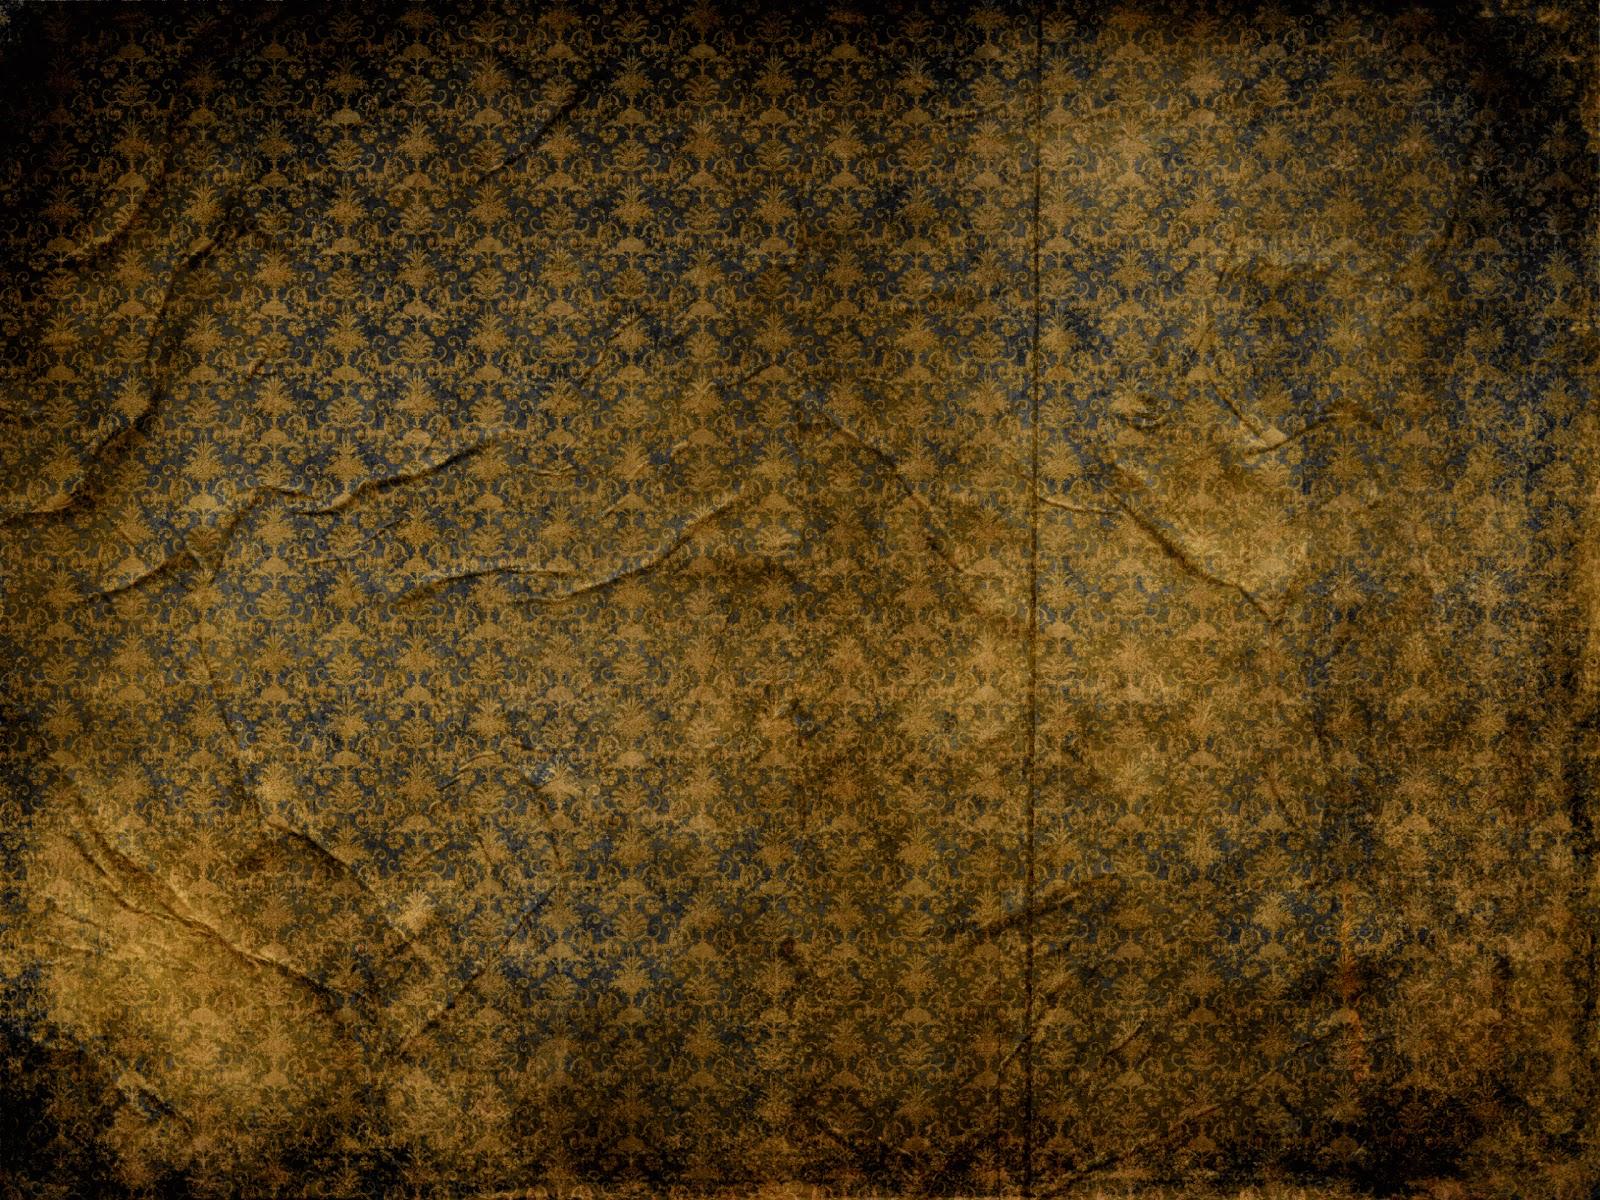 black n gold wallpaper download abandoned green n gold wallpaper 1600x1200